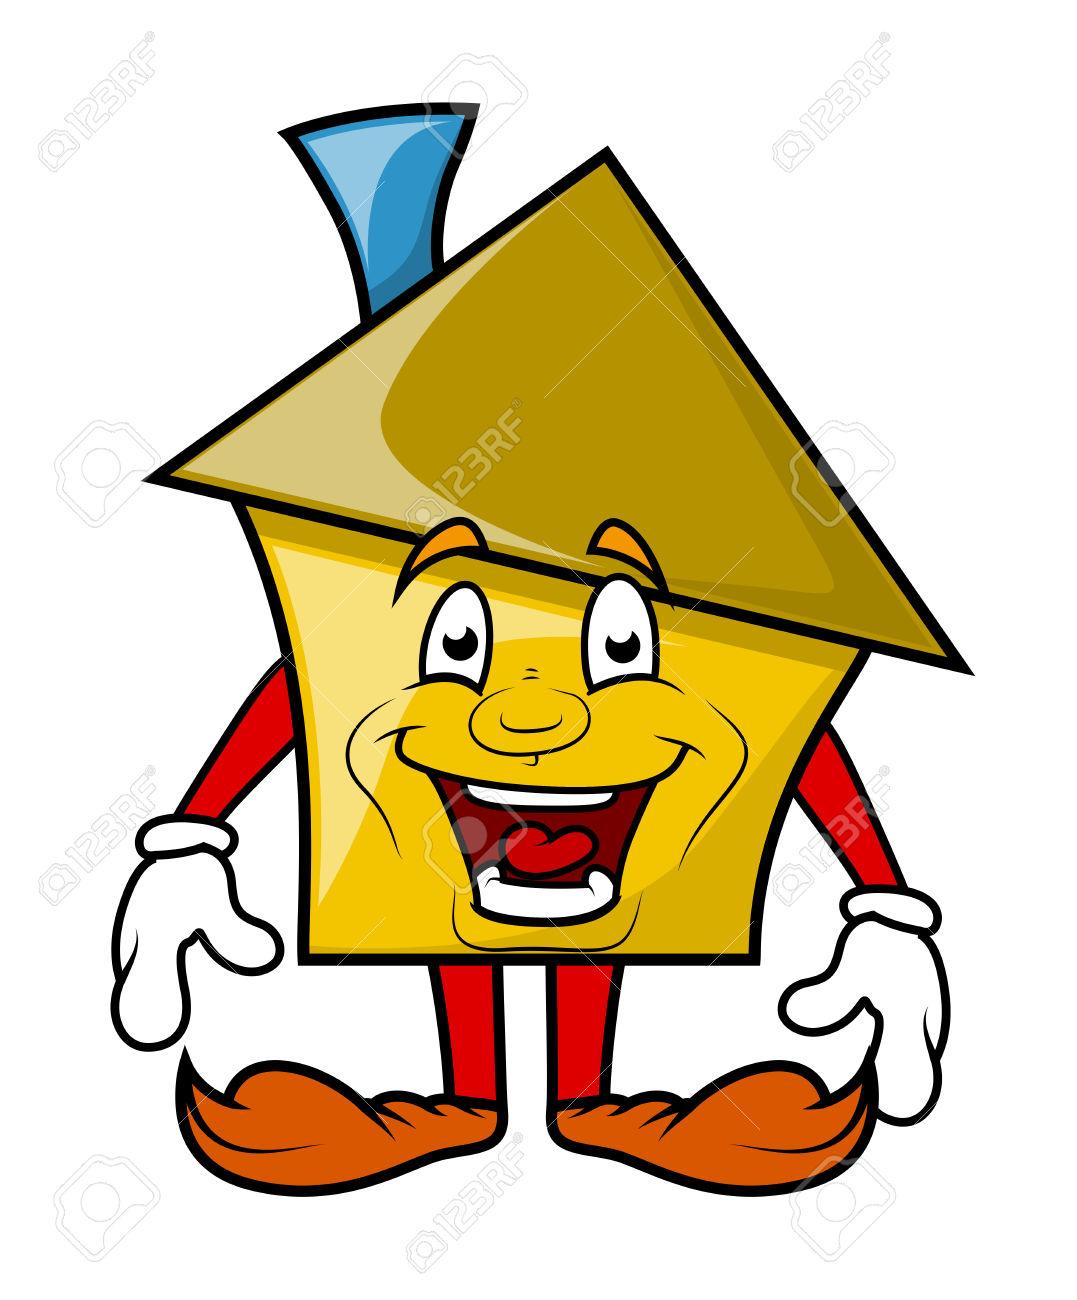 Laughing Cartoon House Character Royalty Free Cliparts, Vectors.